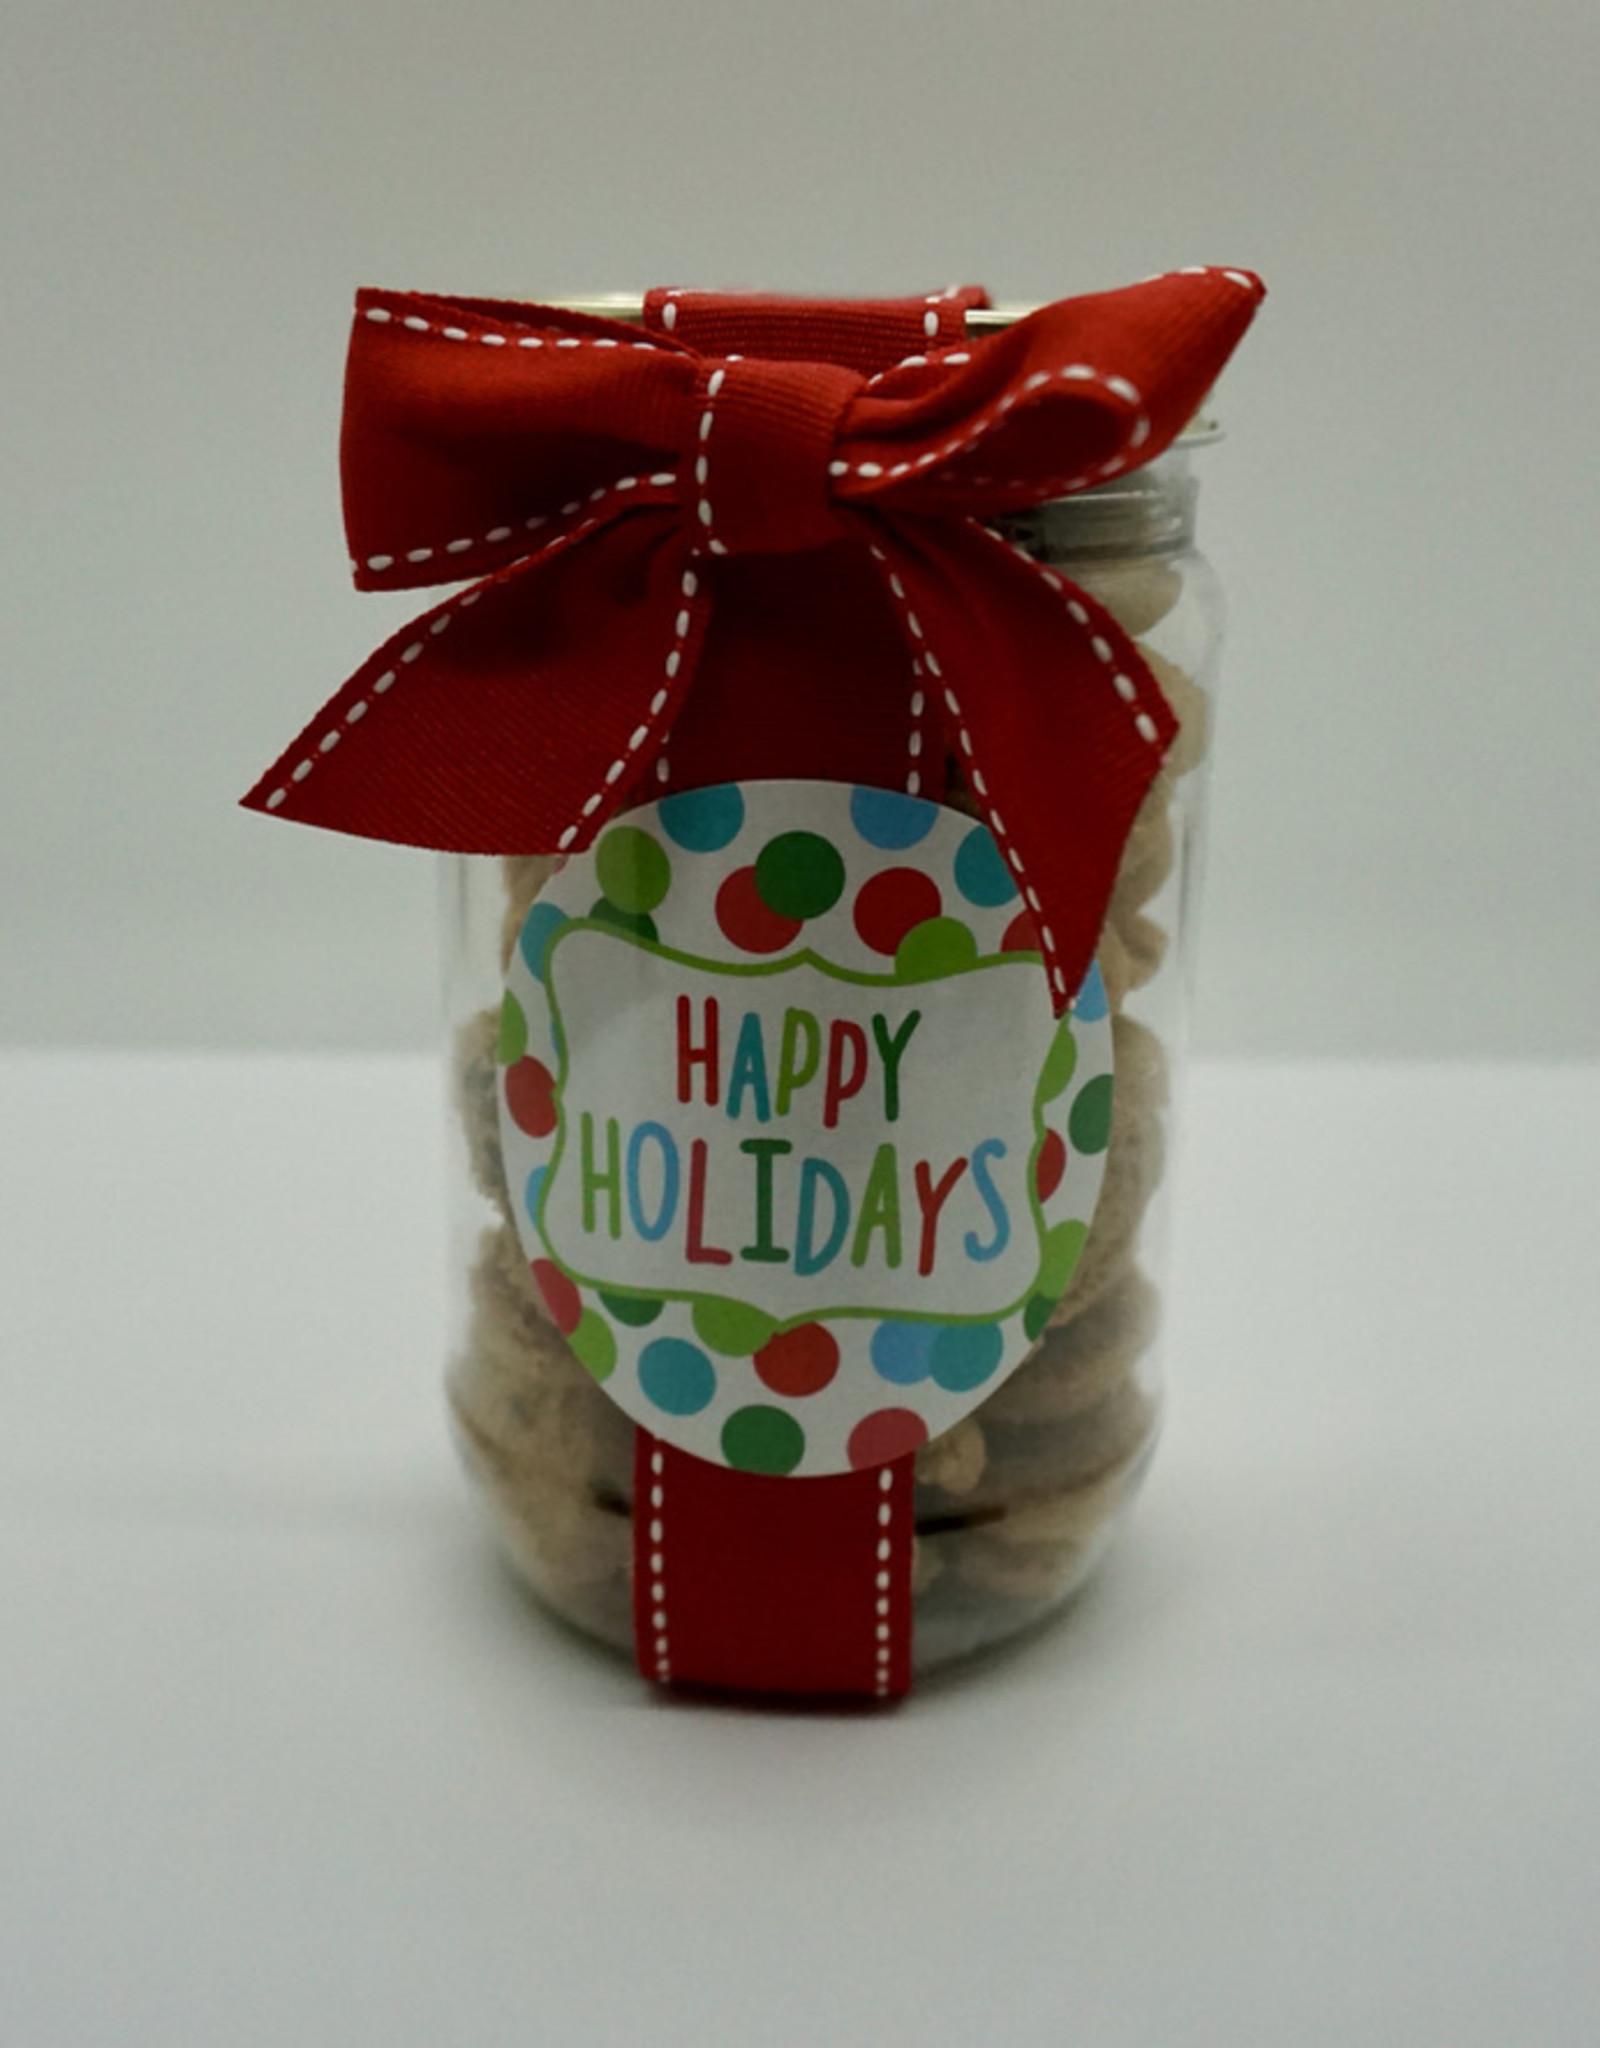 Oh Sugar! - 5oz Jar Choc Chip Cookies - Happy Holidays